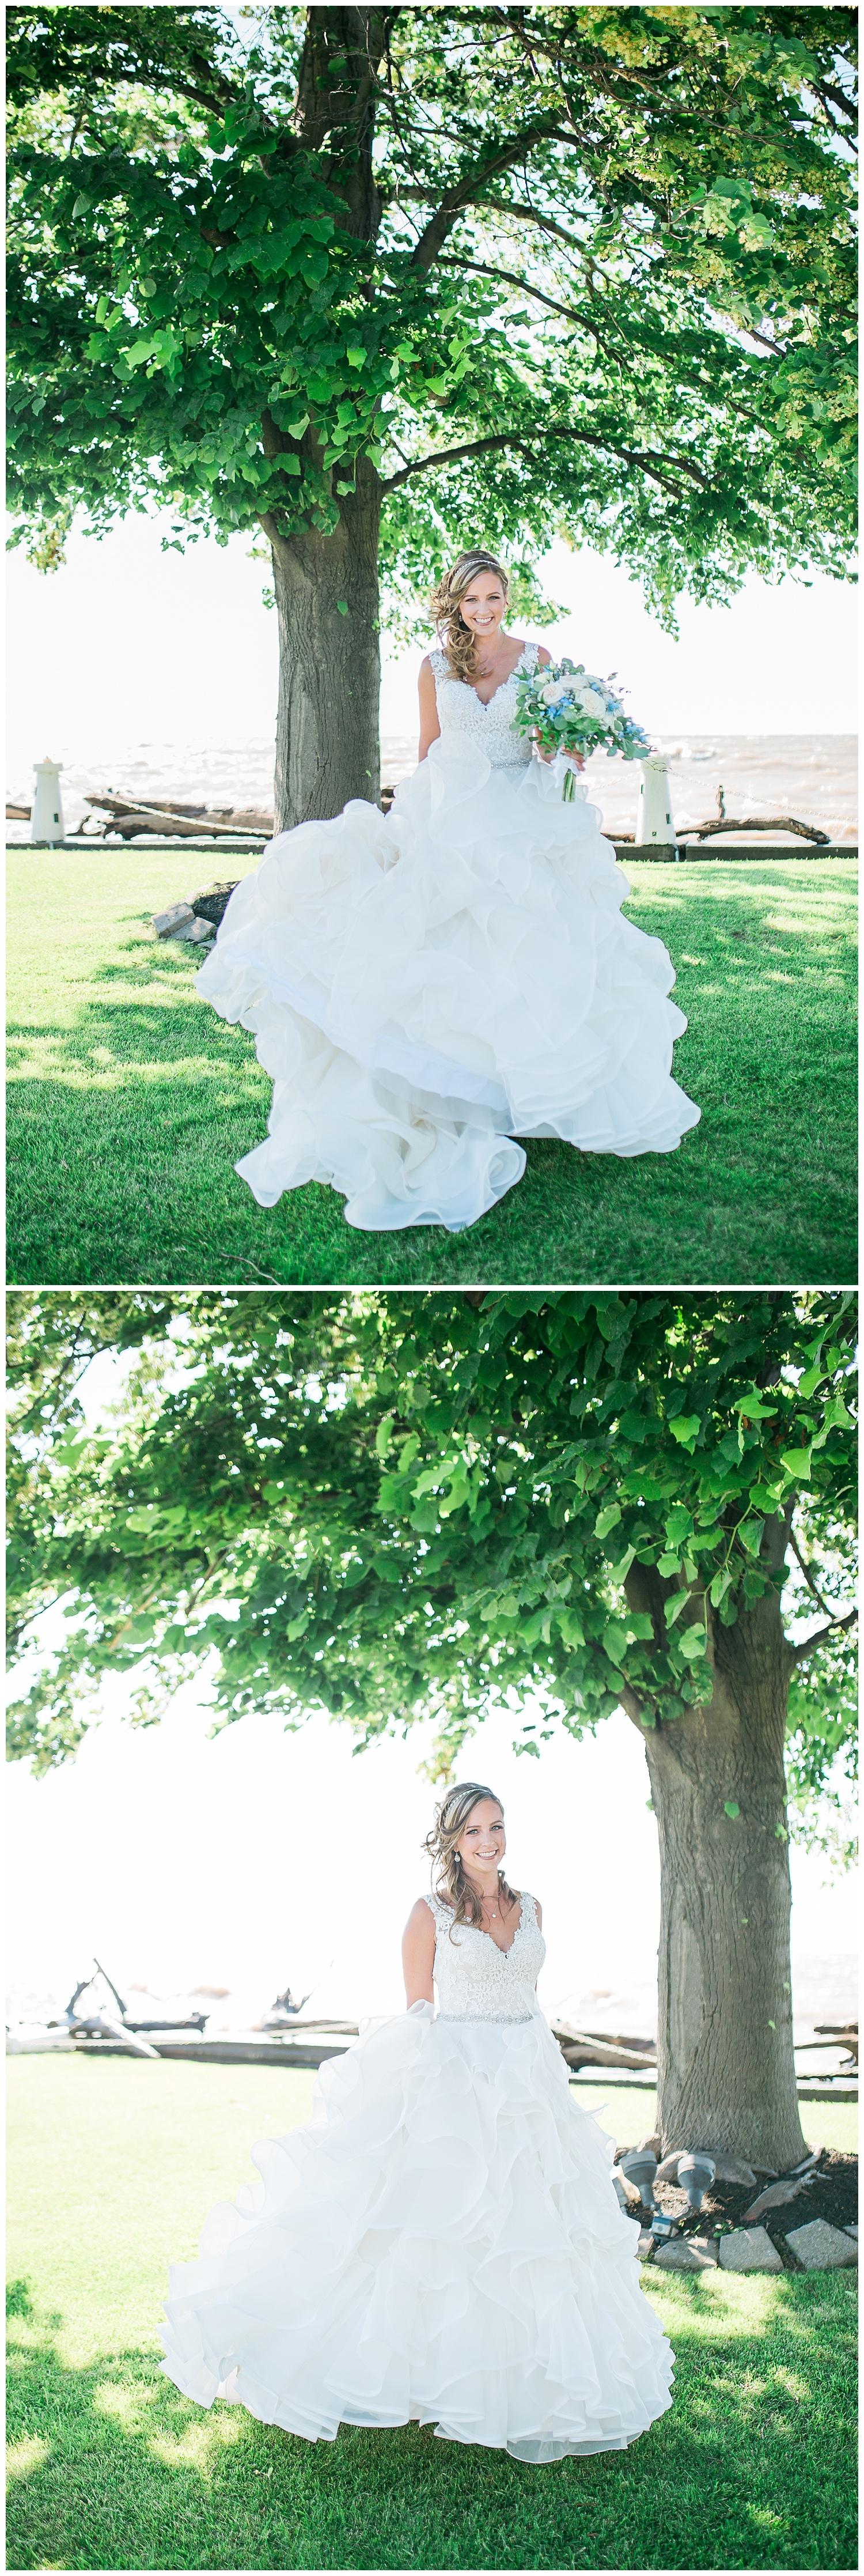 Sean and Andrea - Webster wedding - lass and beau-393_Buffalo wedding photography.jpg